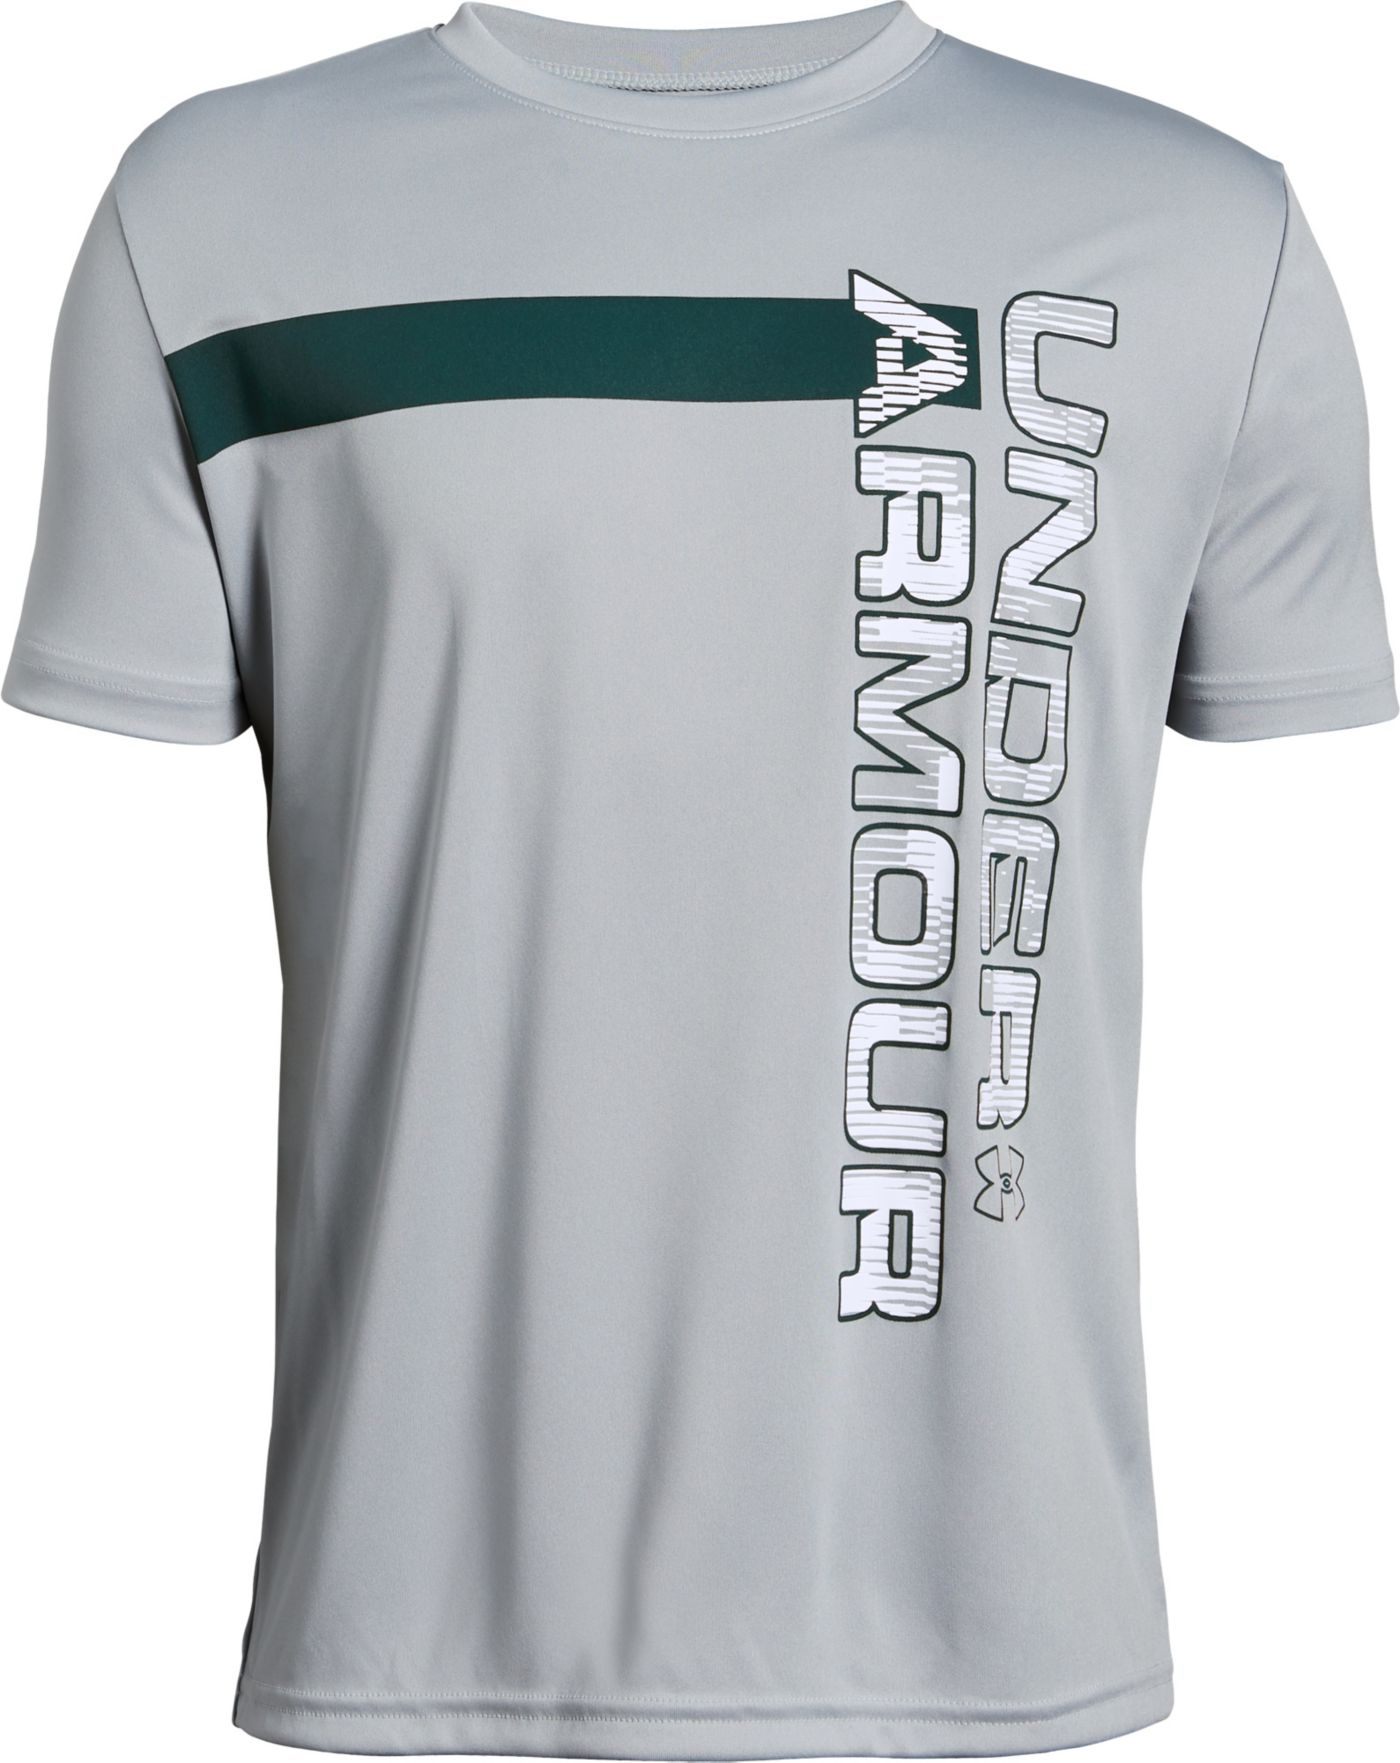 Under Armour Boys' Wordmark T-Shirt